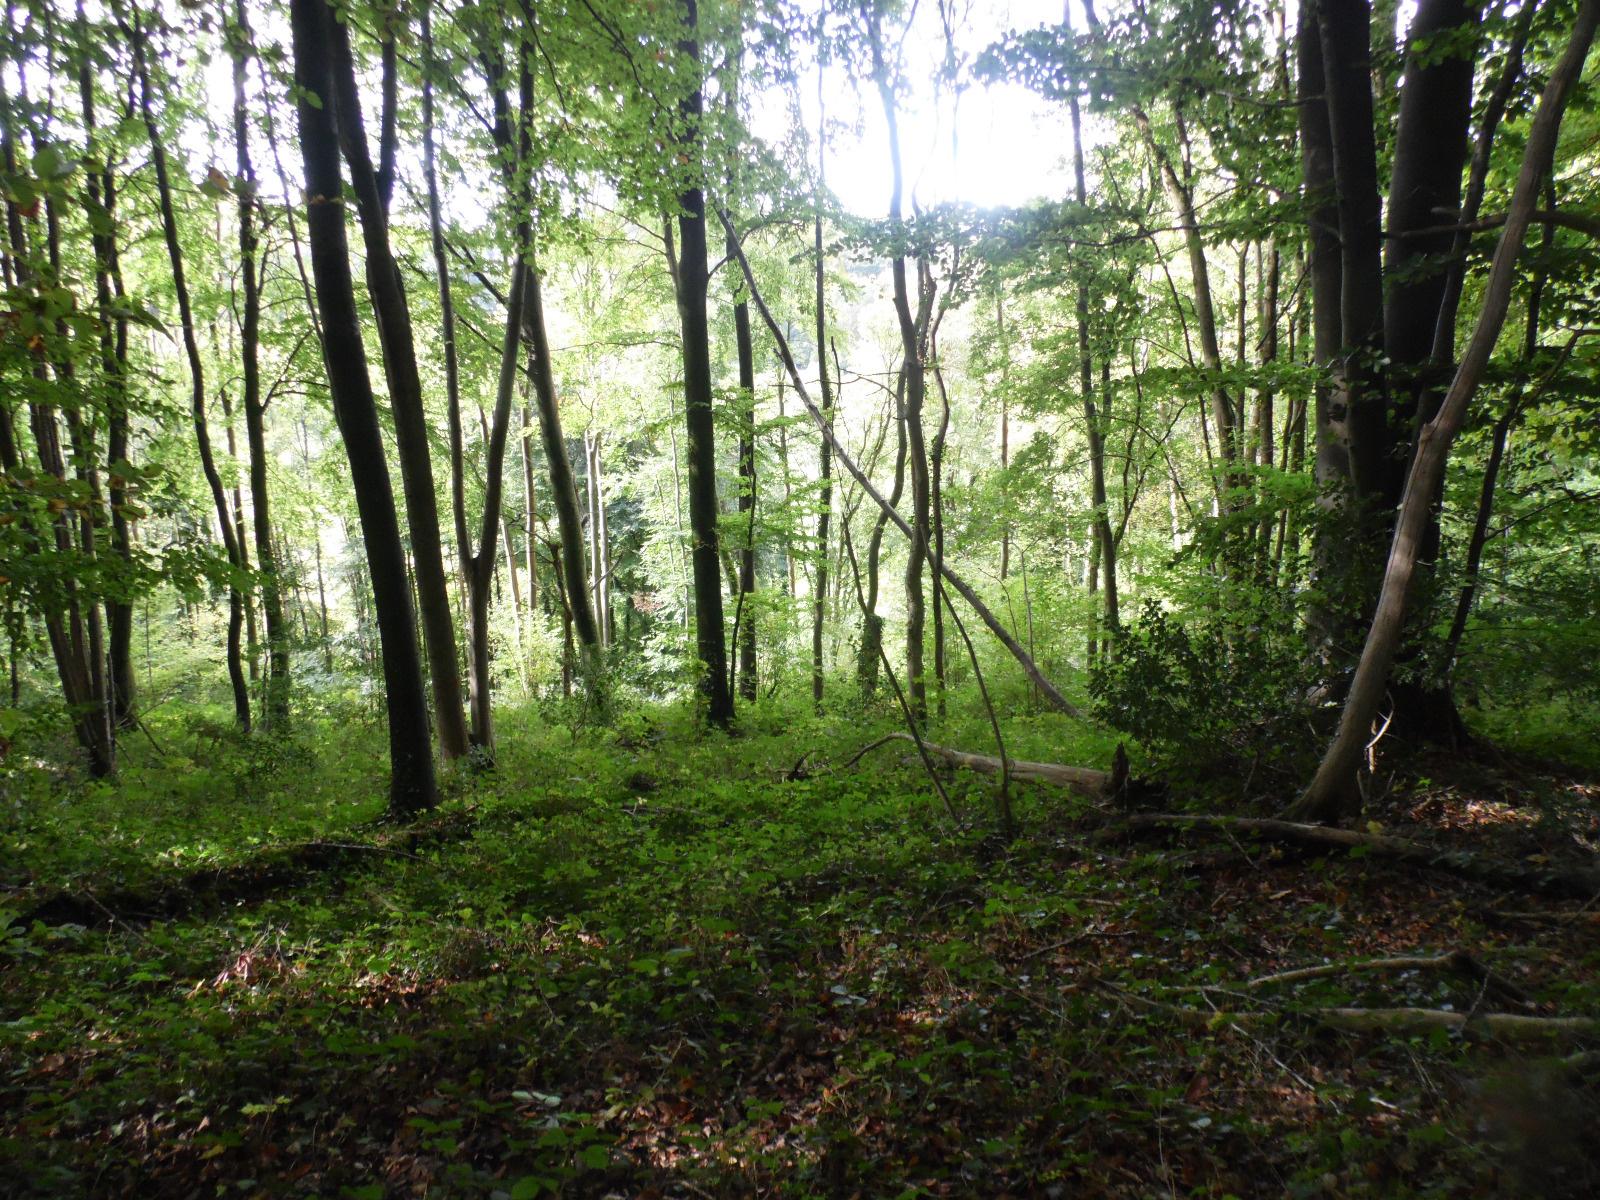 vente vente parcelle de bois exploitable 2 hectares pont audemer eure